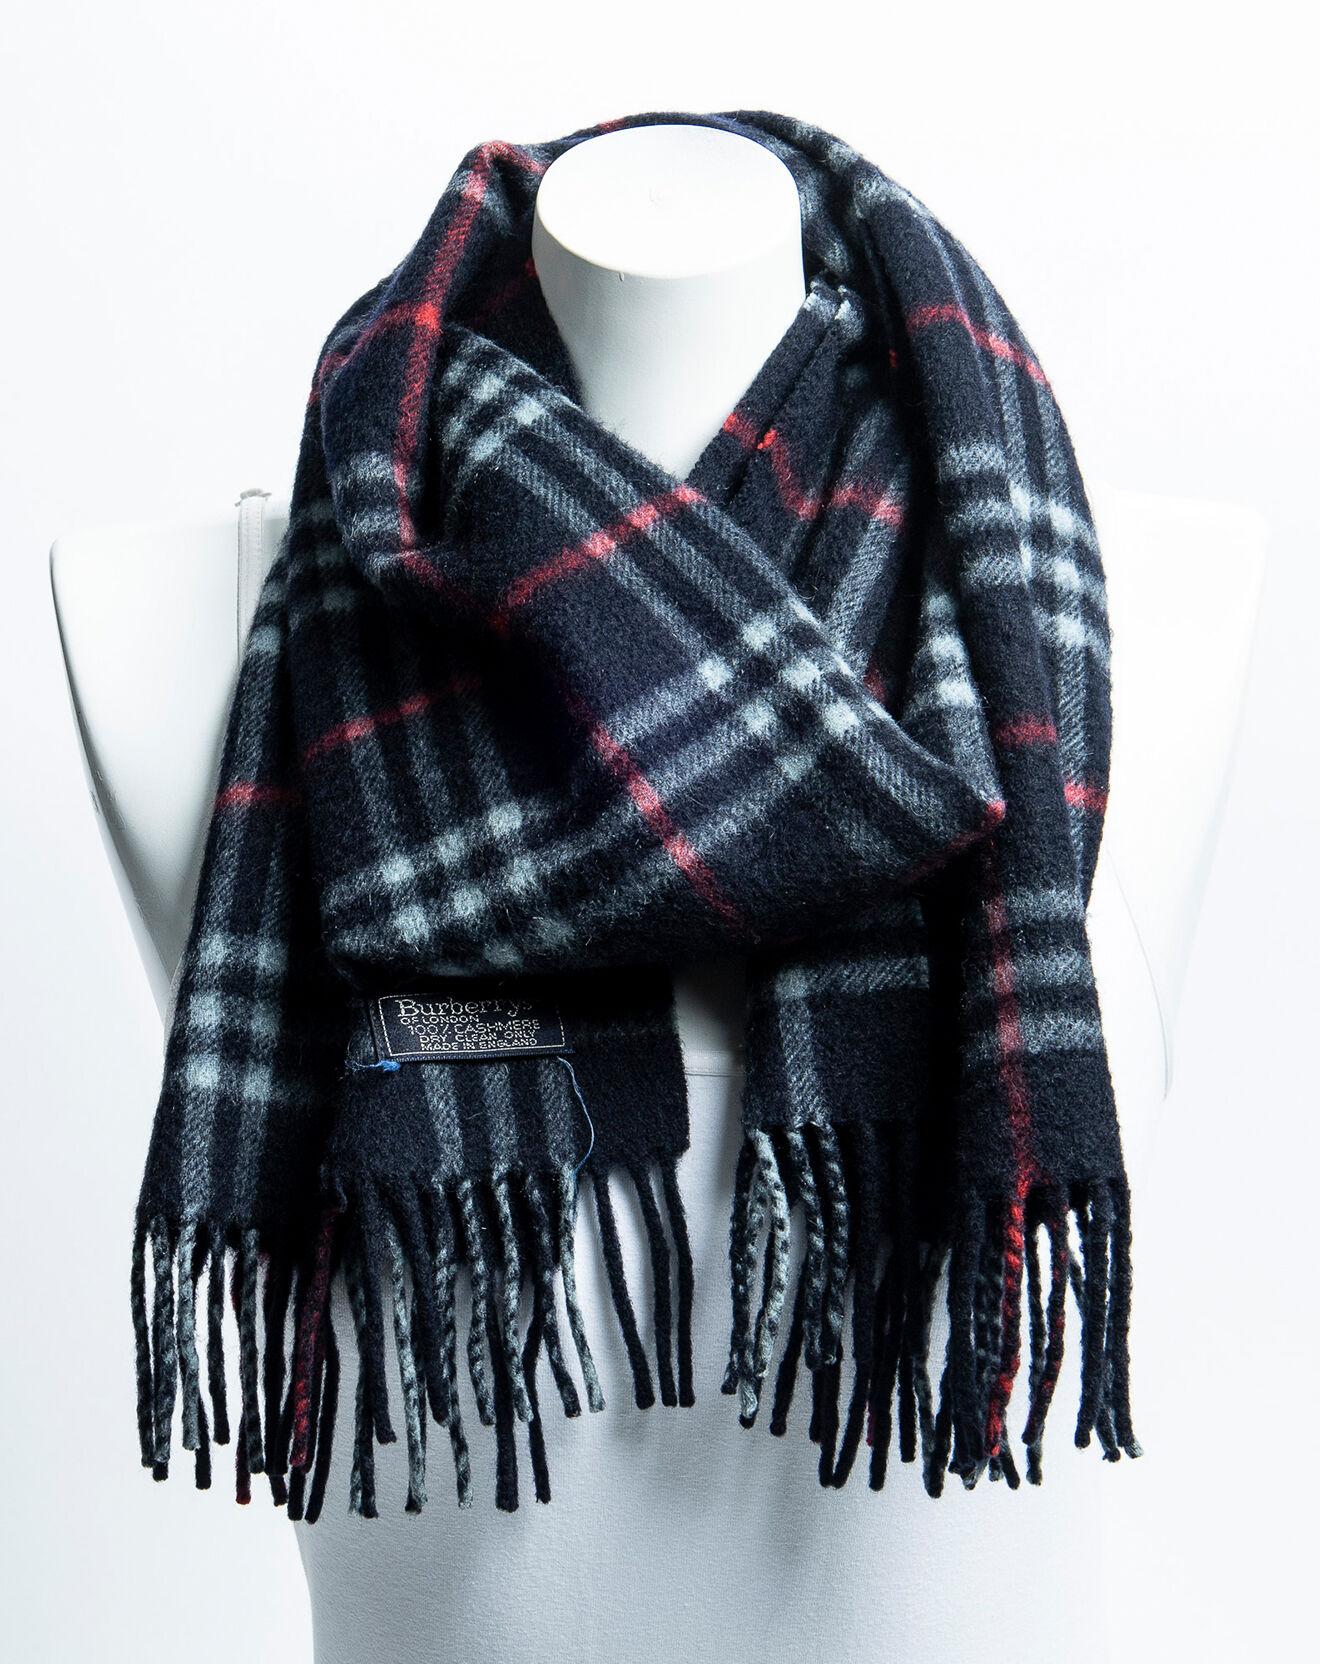 Foulard Muffler en Soie noir/rouge/gris 145x31 cm